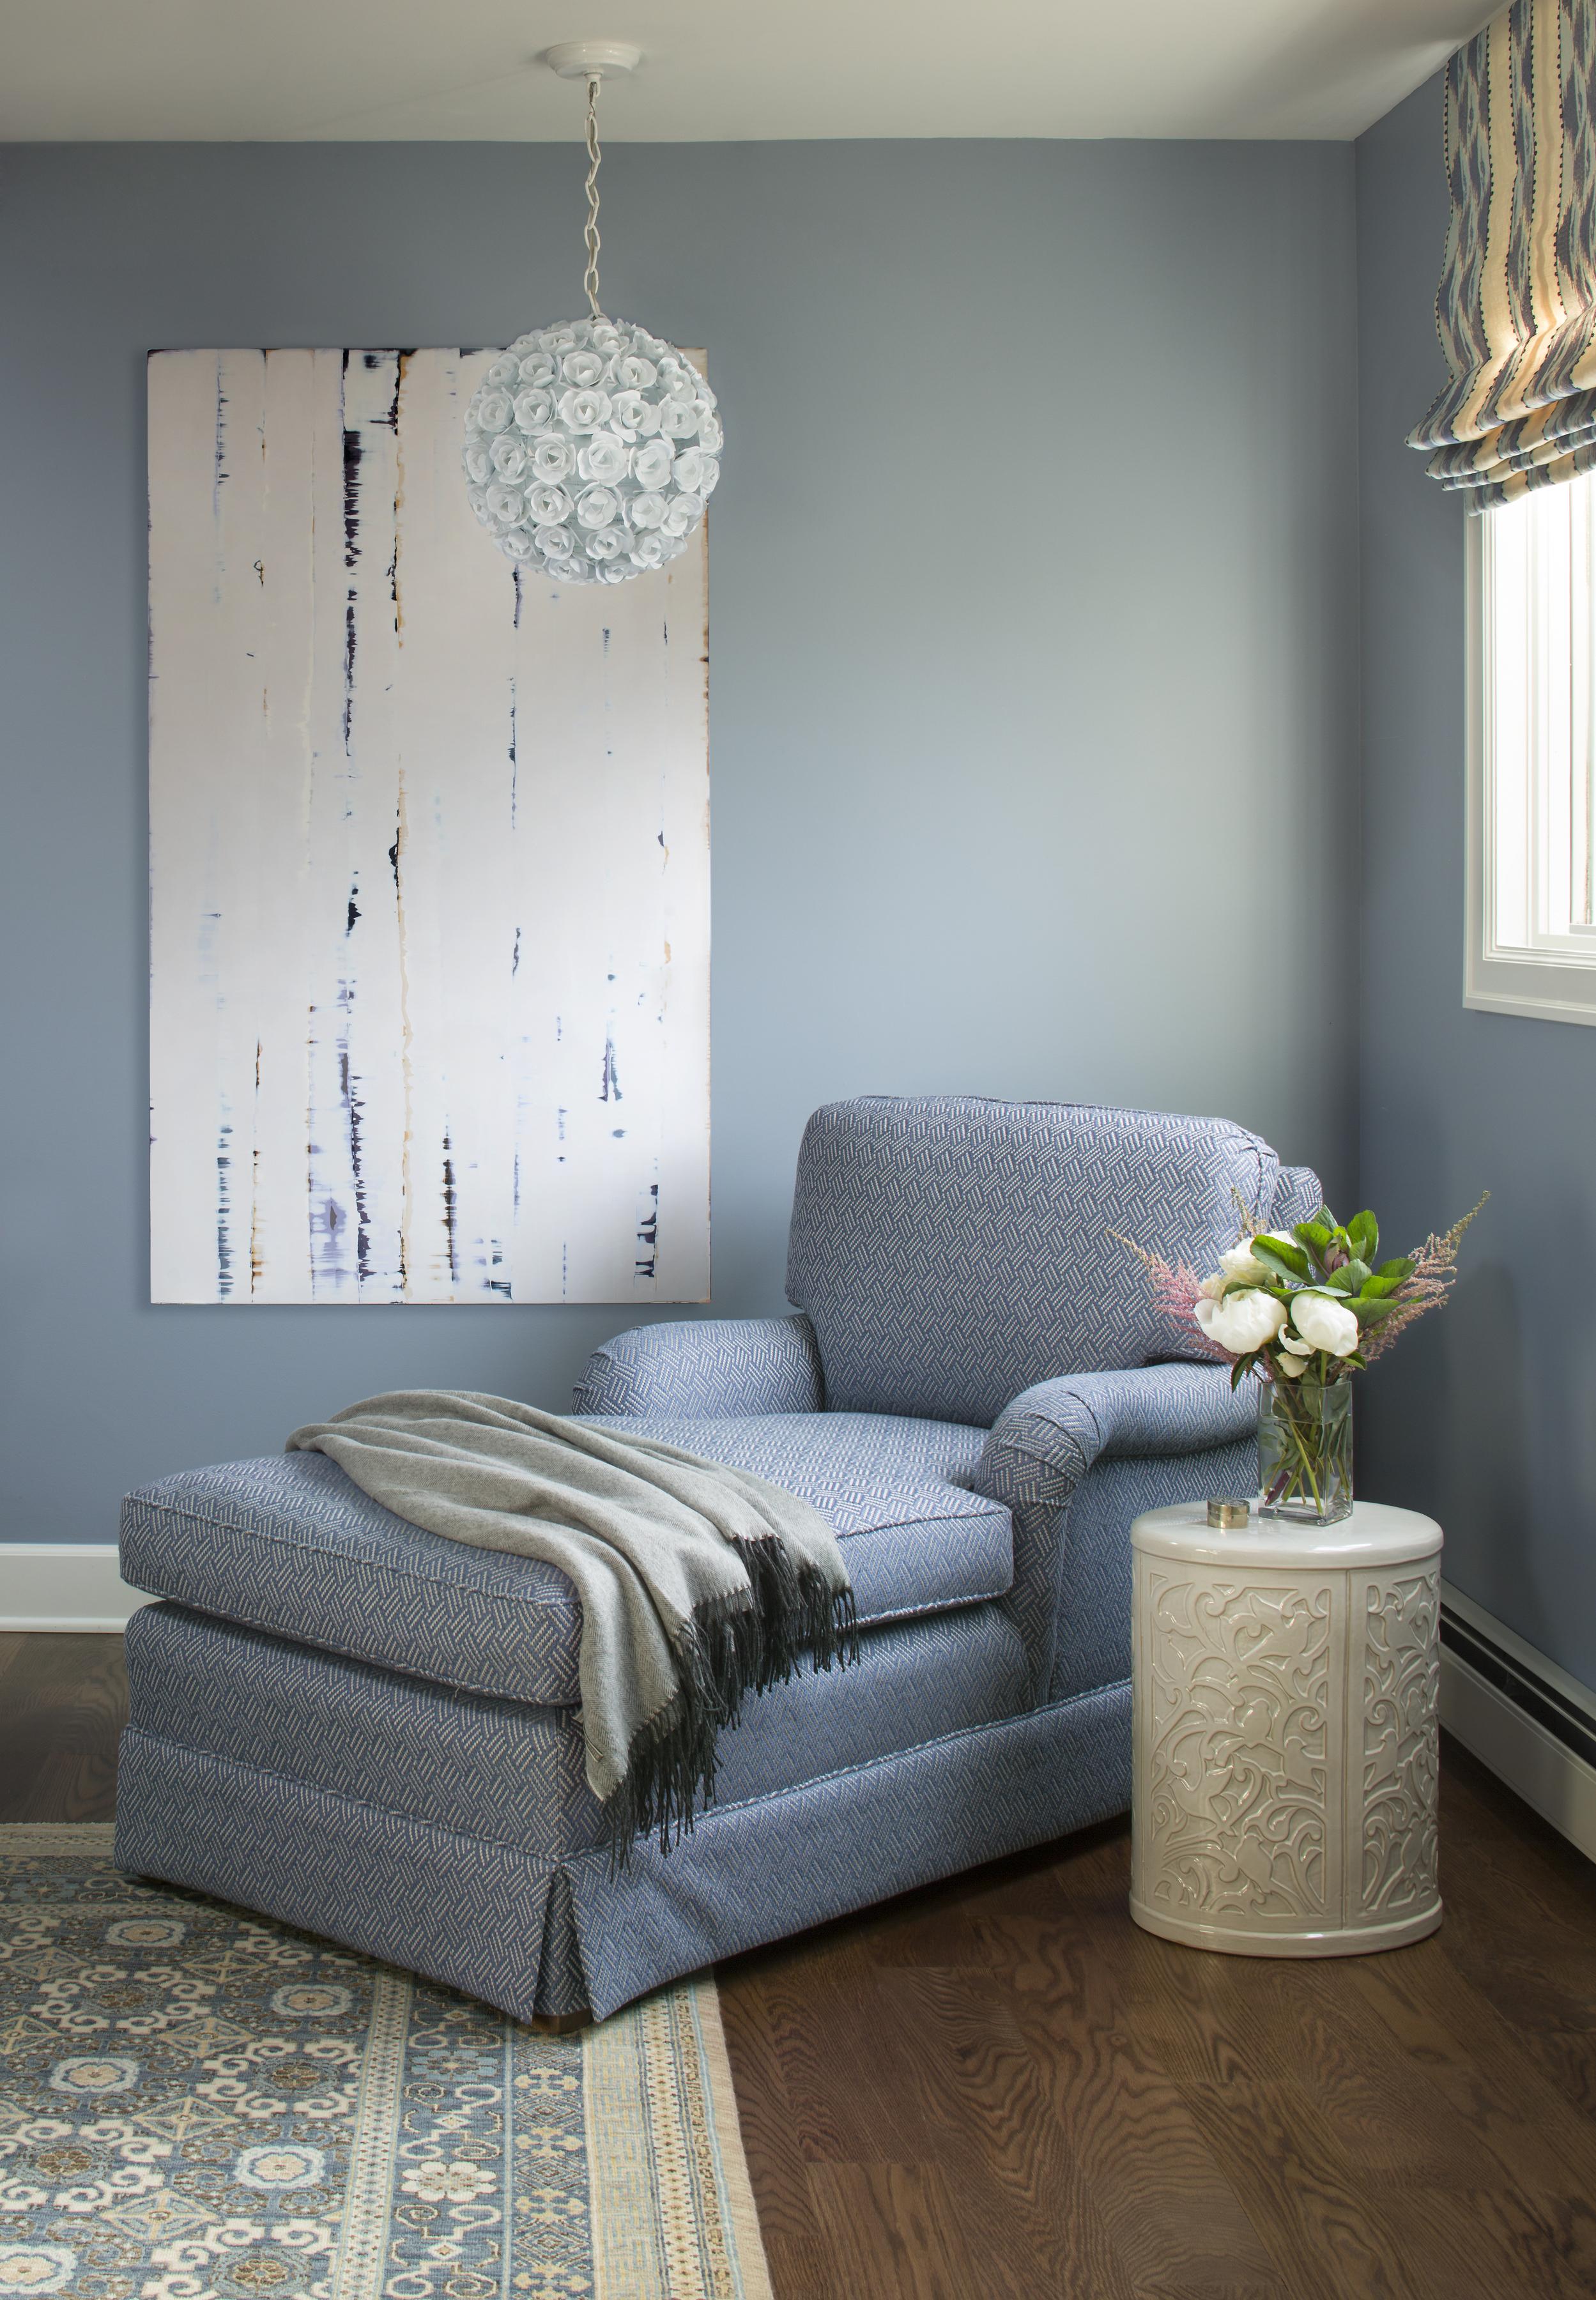 Private Residence. Design: Armijo Design Group . Kimberly Gavin photography. Artist: Chris Richter.